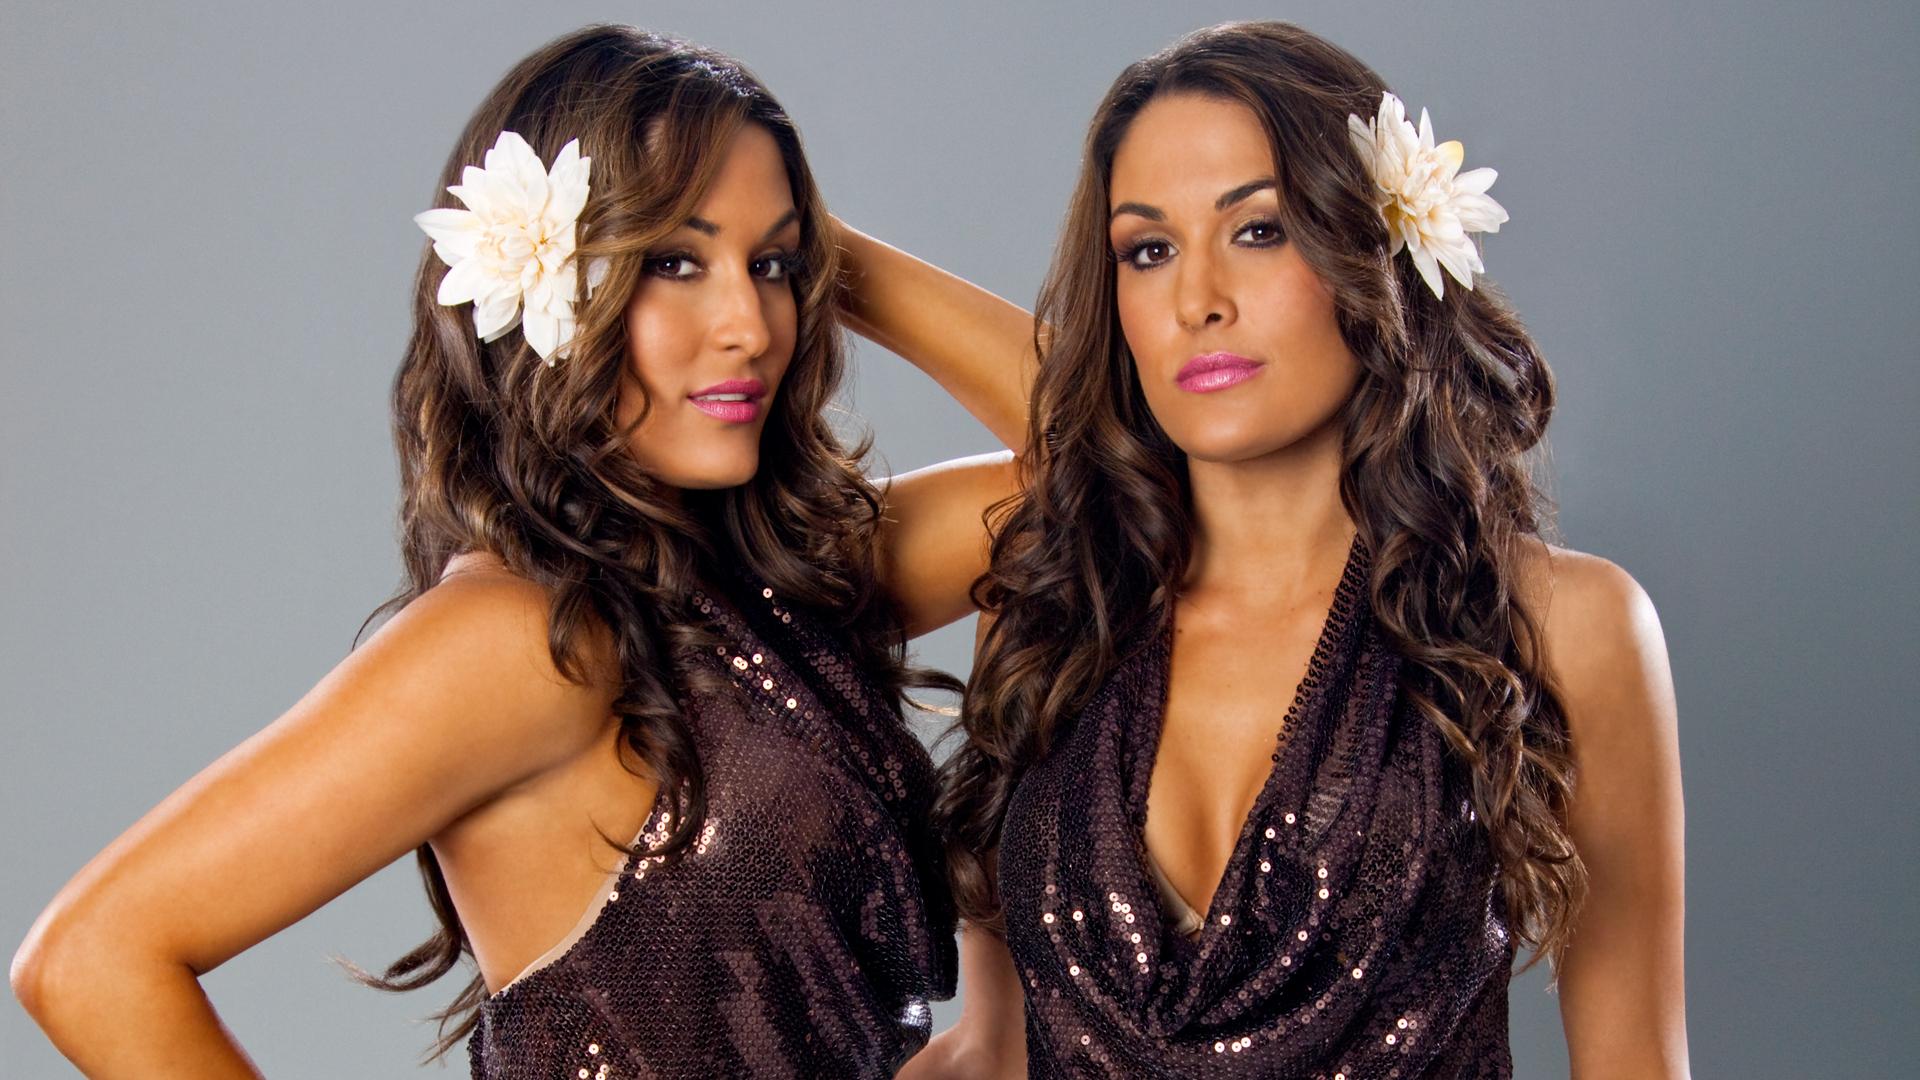 beLLas   WWE Divas Wallpaper 17113057 1920x1080